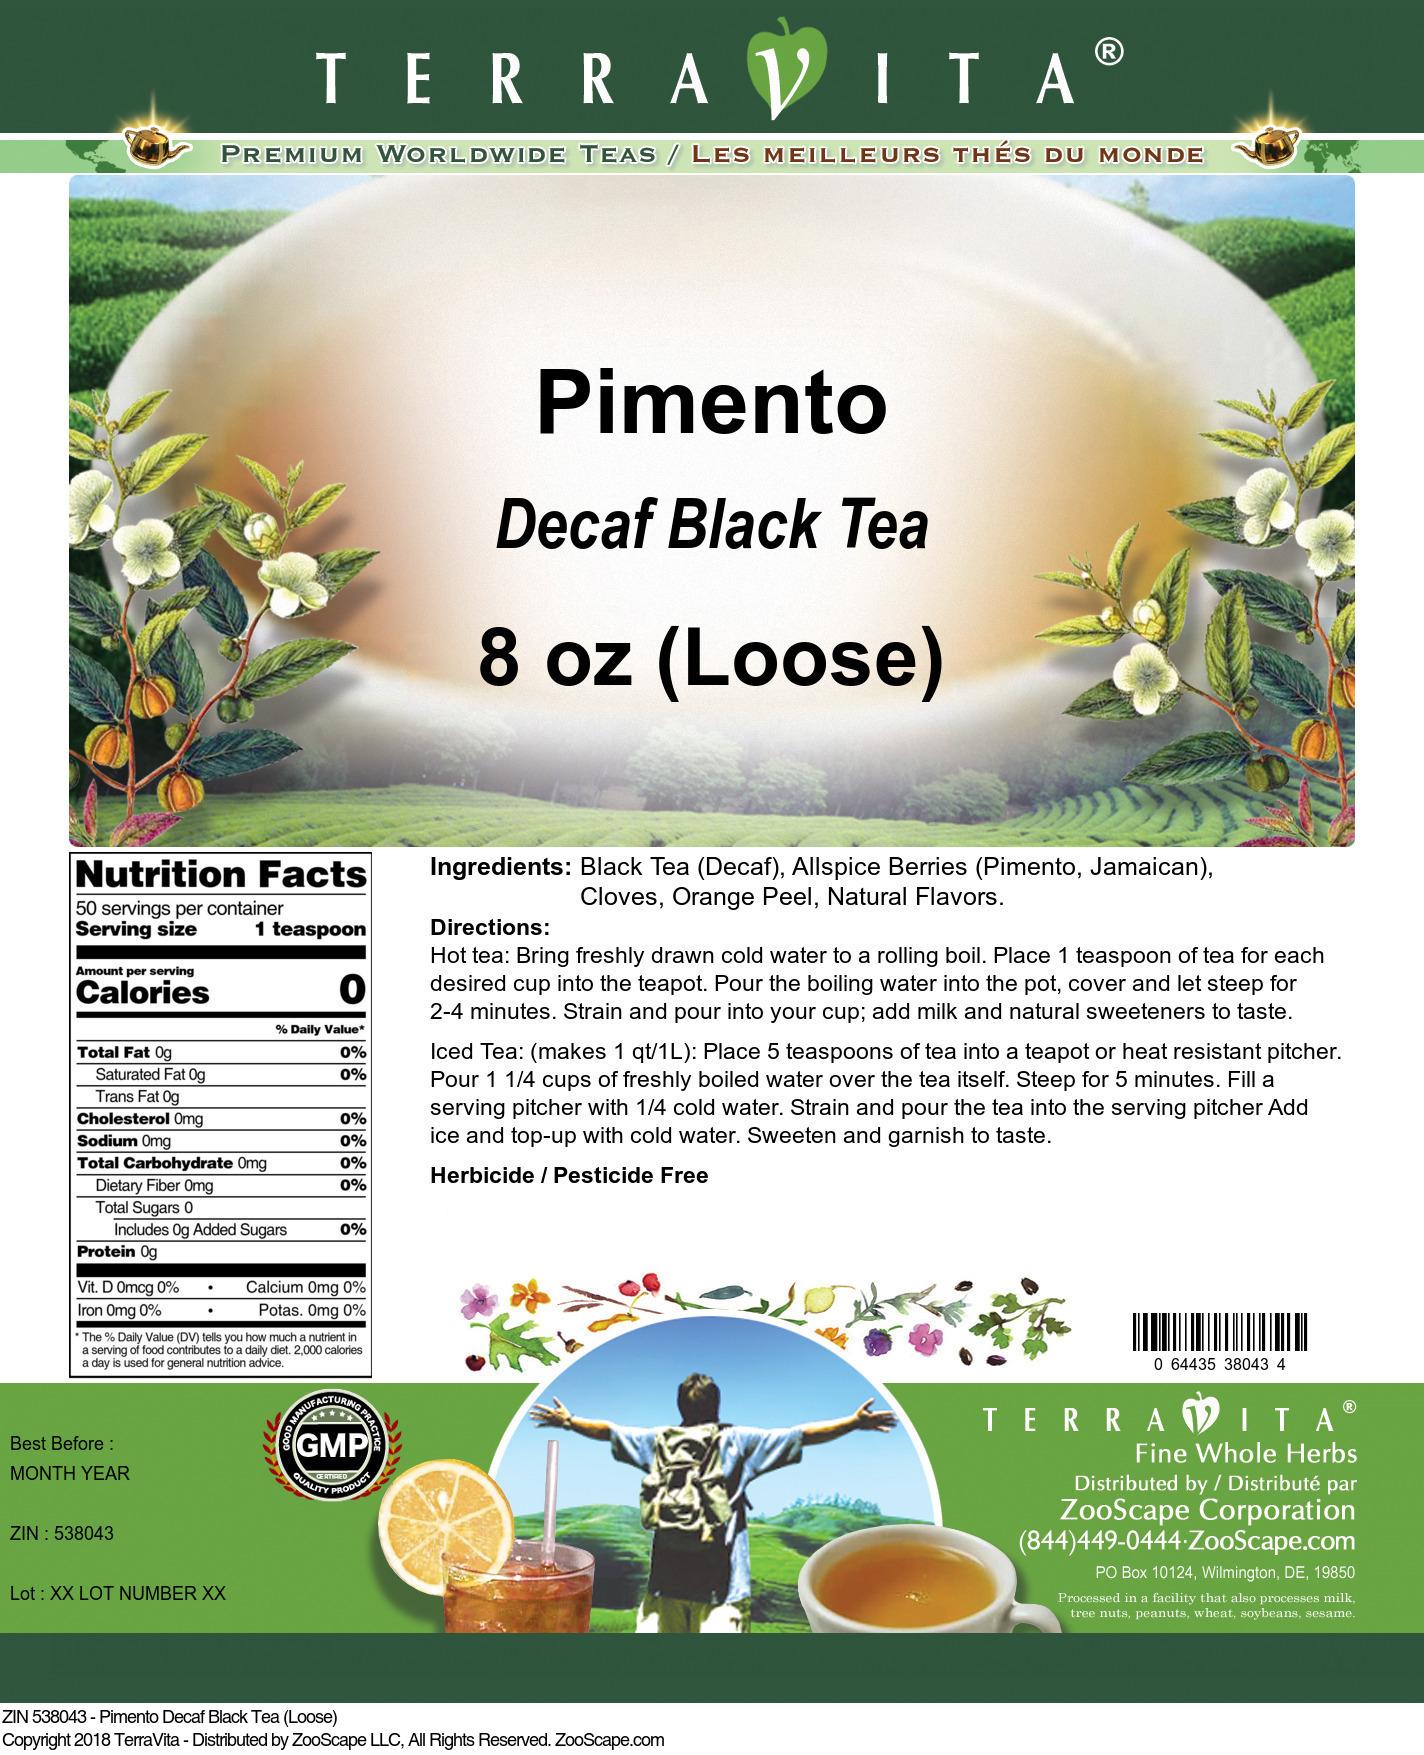 Pimento Decaf Black Tea (Loose)